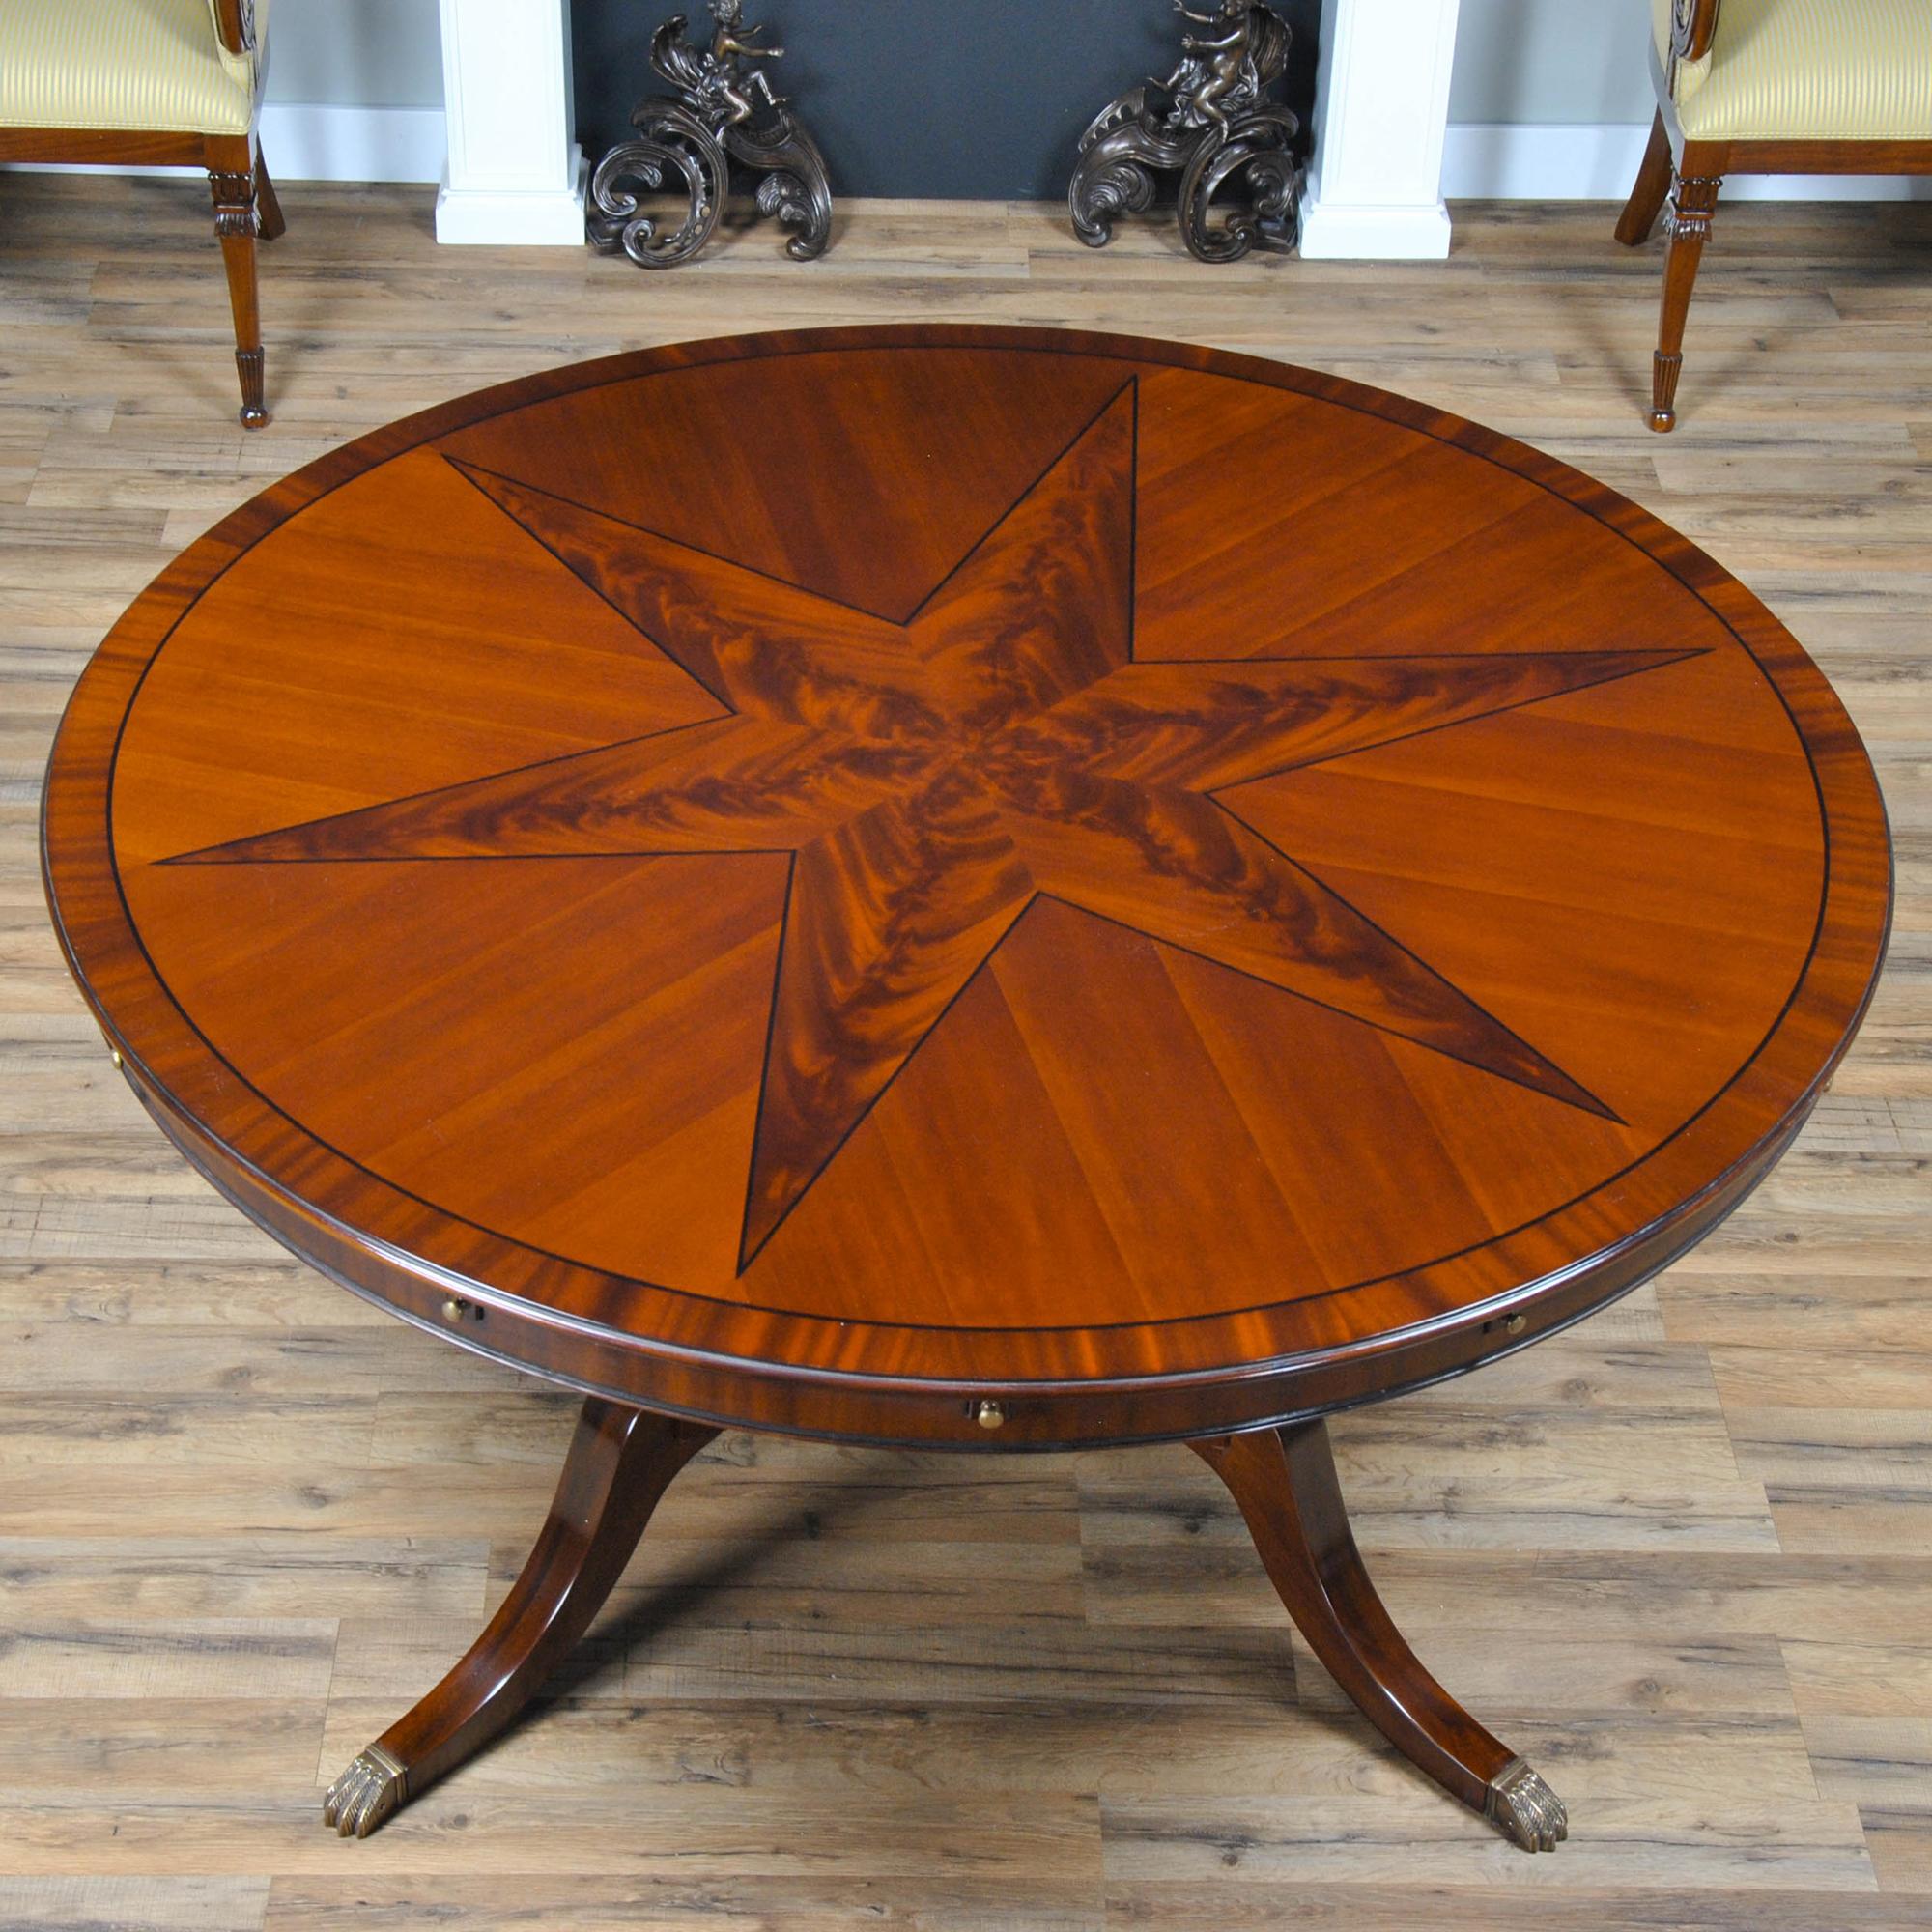 Star Perimeter Dining Table Niagara Furniture Round